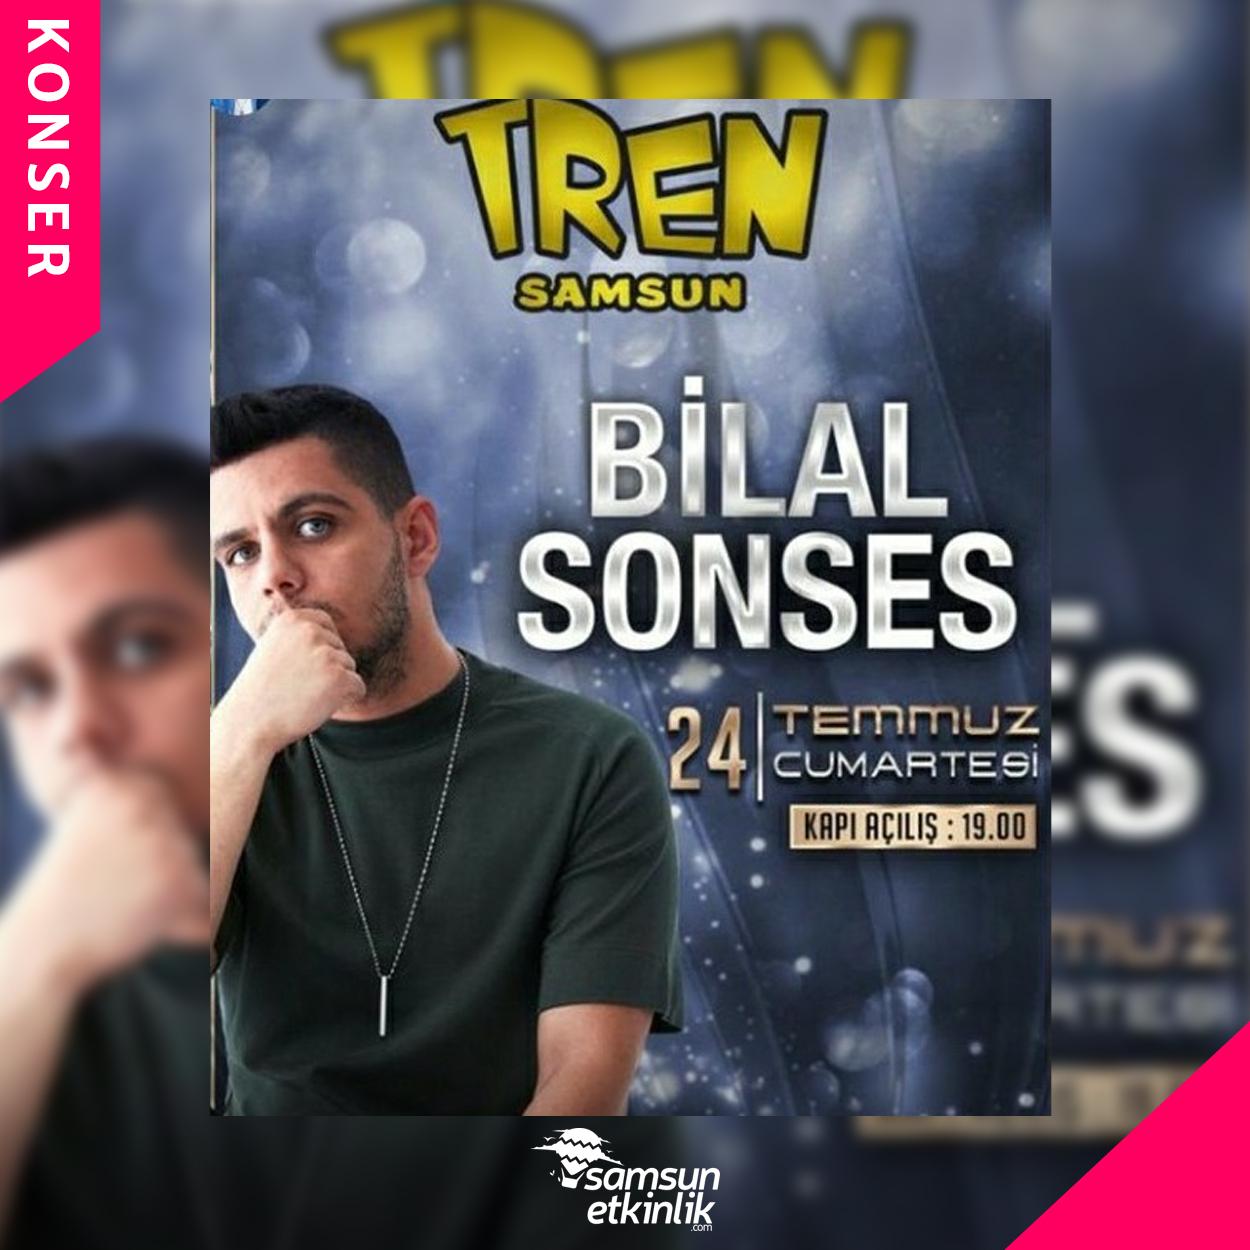 Bilal Sonses- Tren Samsun